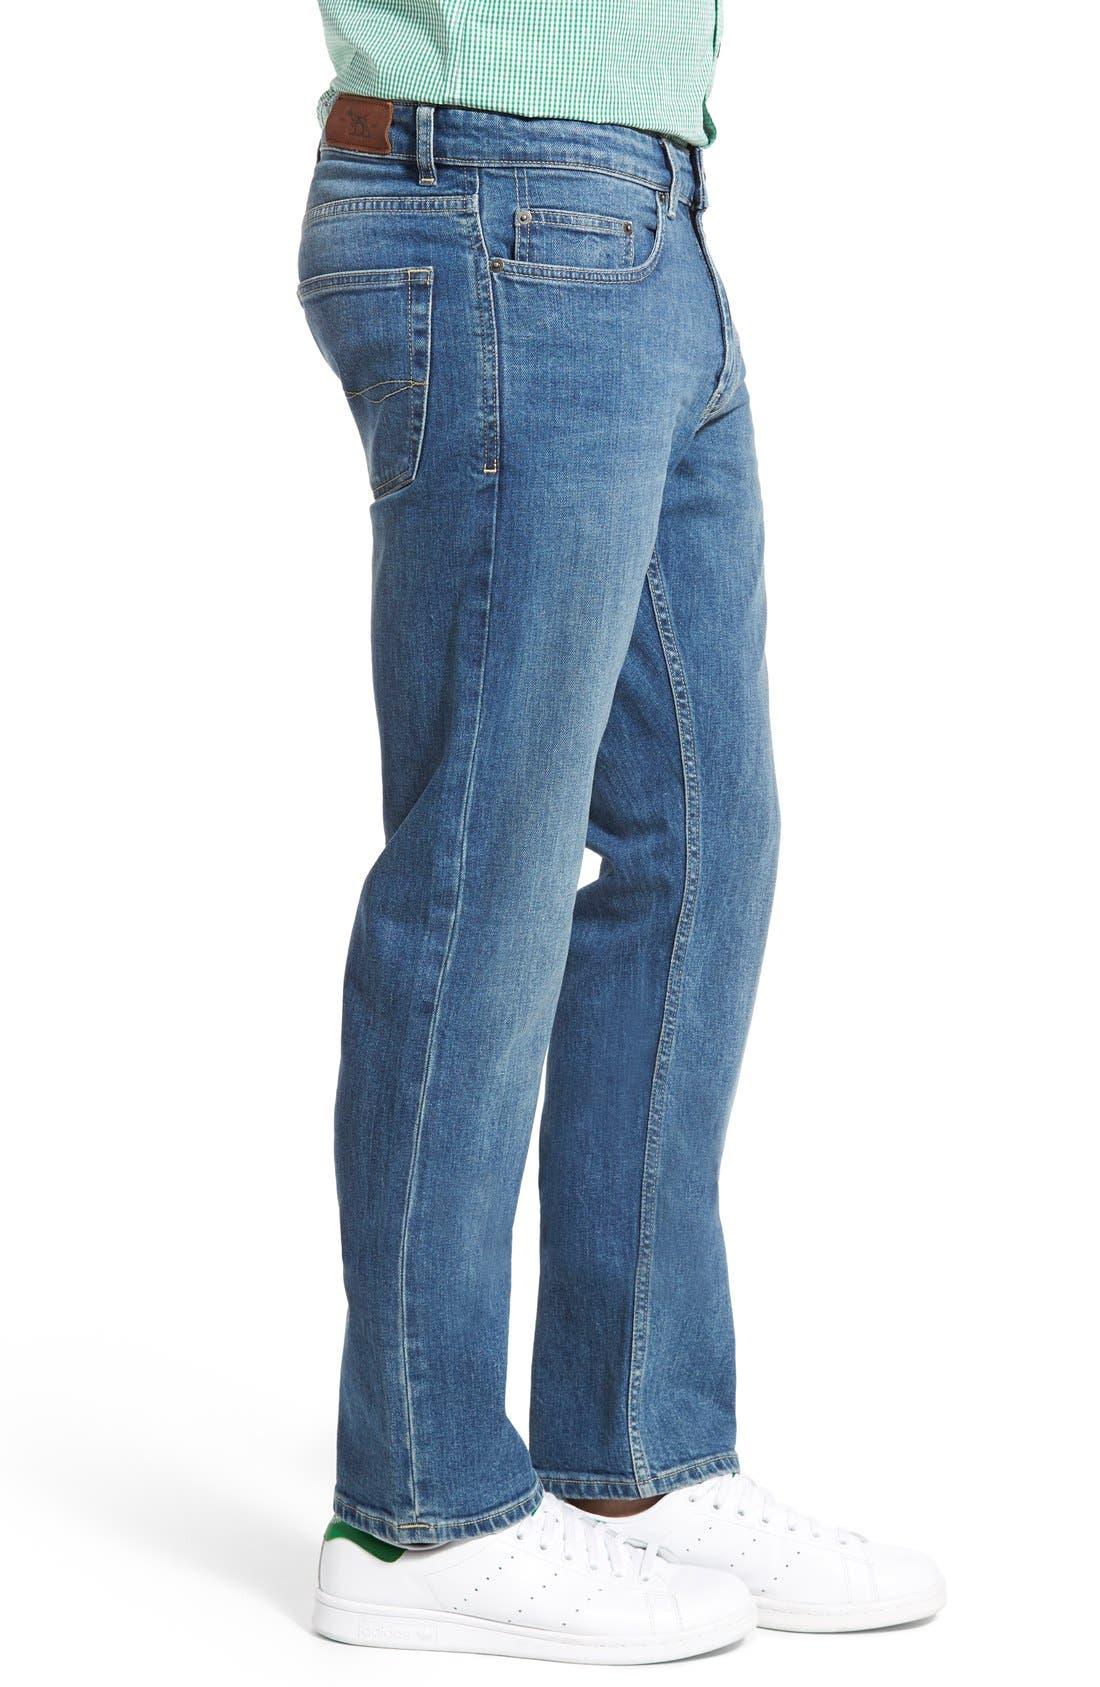 'Nicholls' Regular Fit Straight Leg Jeans,                             Alternate thumbnail 6, color,                             DENIM